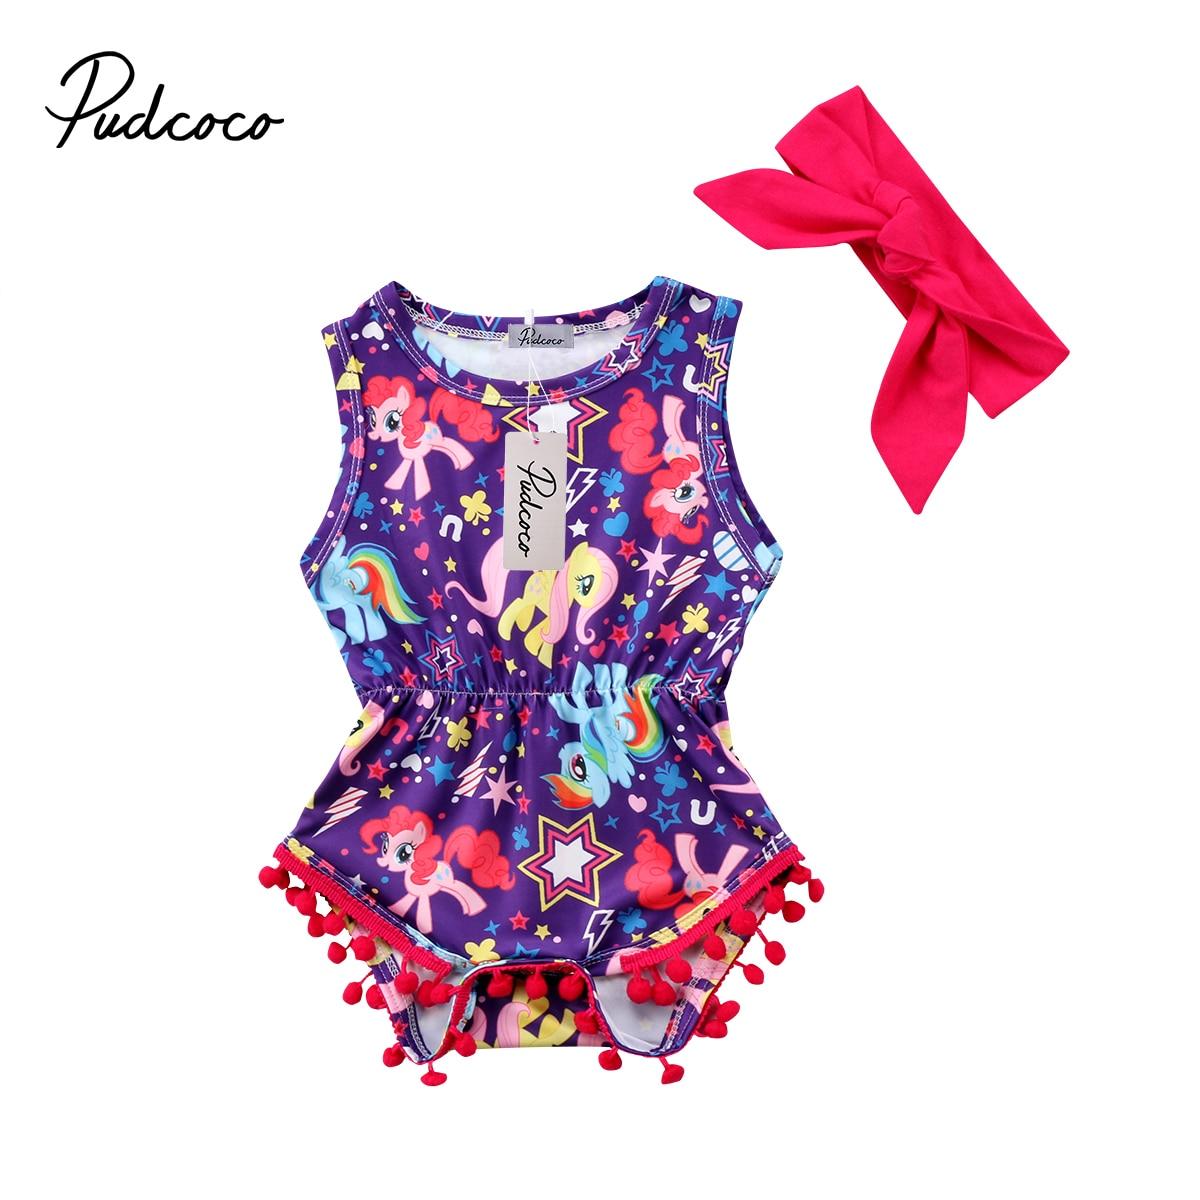 Cute Baby Clothing Newborn Baby Girls Unicorn Print Romper Jumpsuit Sleeveless Jumper Outfits Costume 0-2T